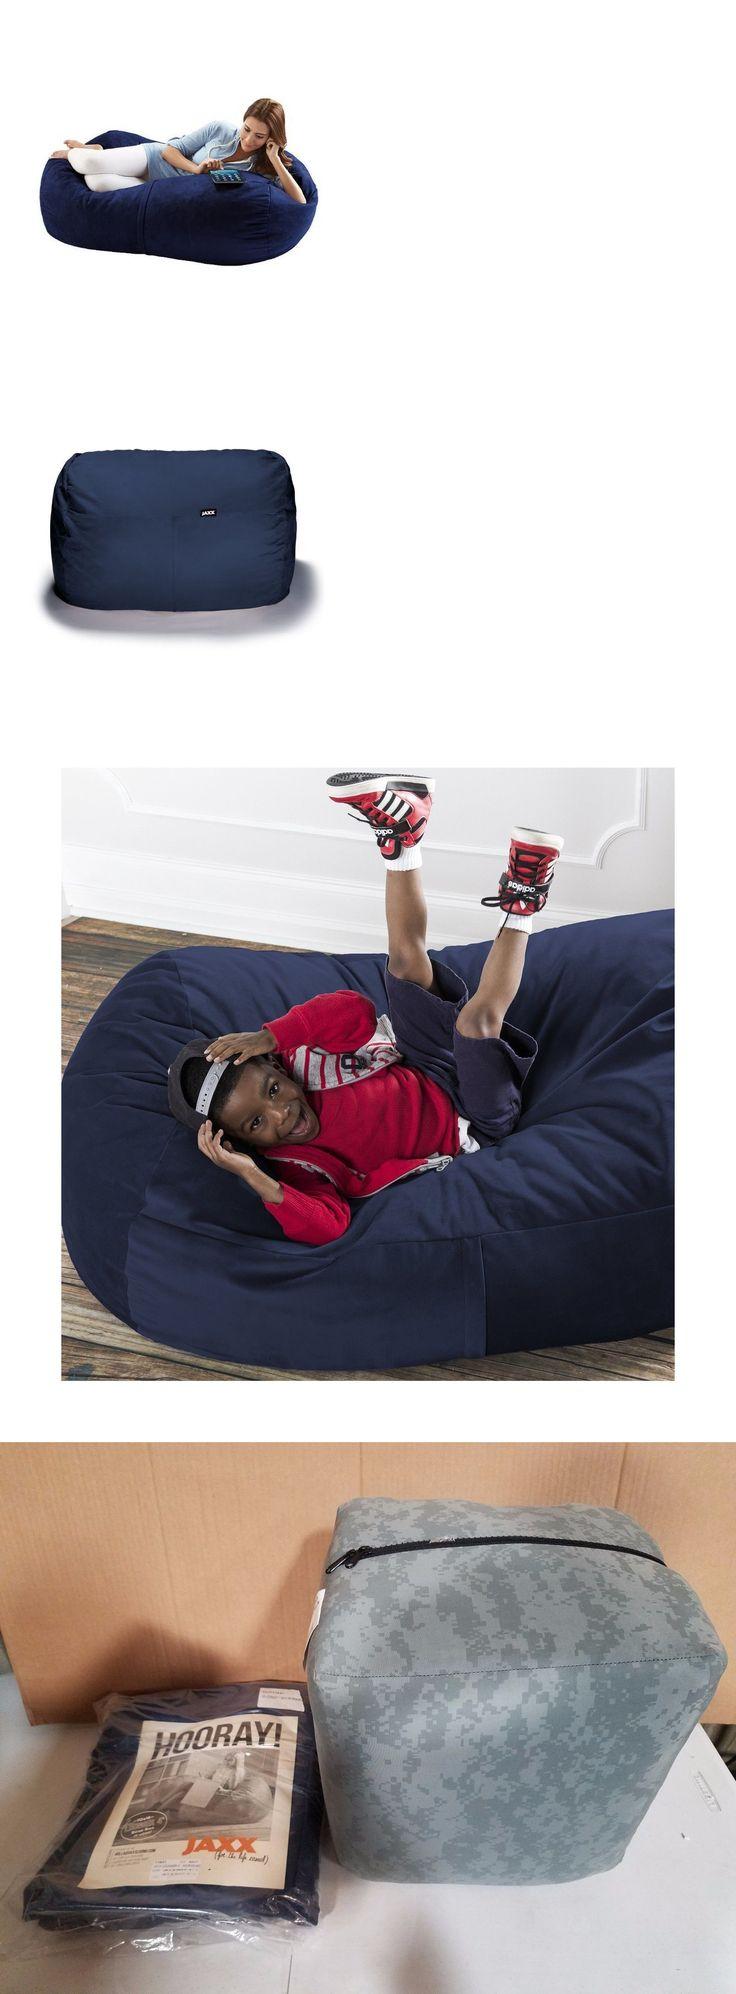 Big joe zip modular armless chair at brookstone buy now - Bean Bags And Inflatables 48319 Jaxx Bean Bags Sofa Saxx Lounger 4 Feet Navy